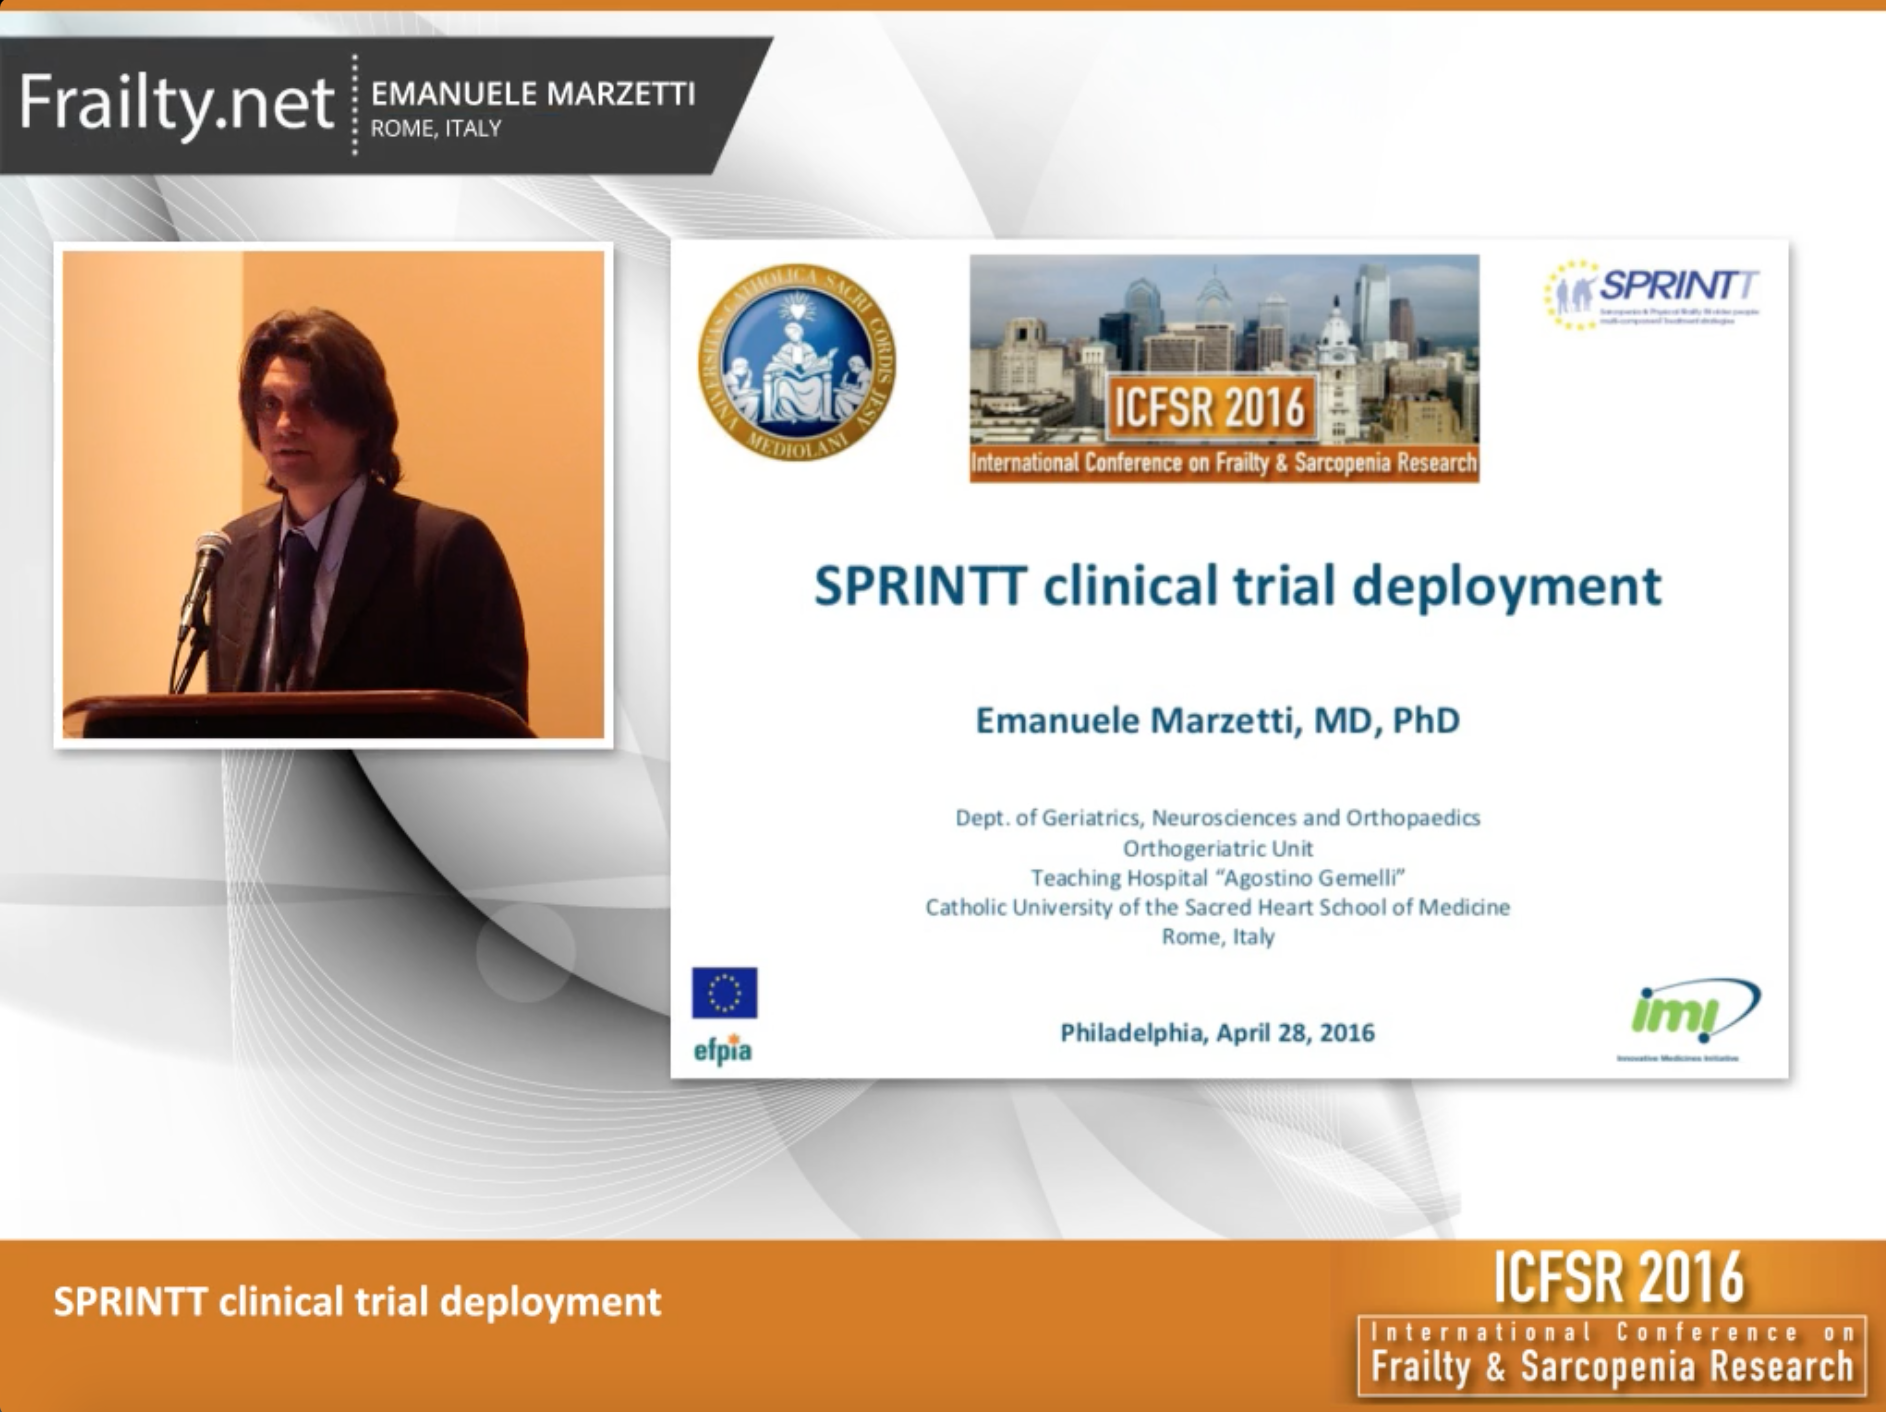 Dr. Emanuele Marzetti